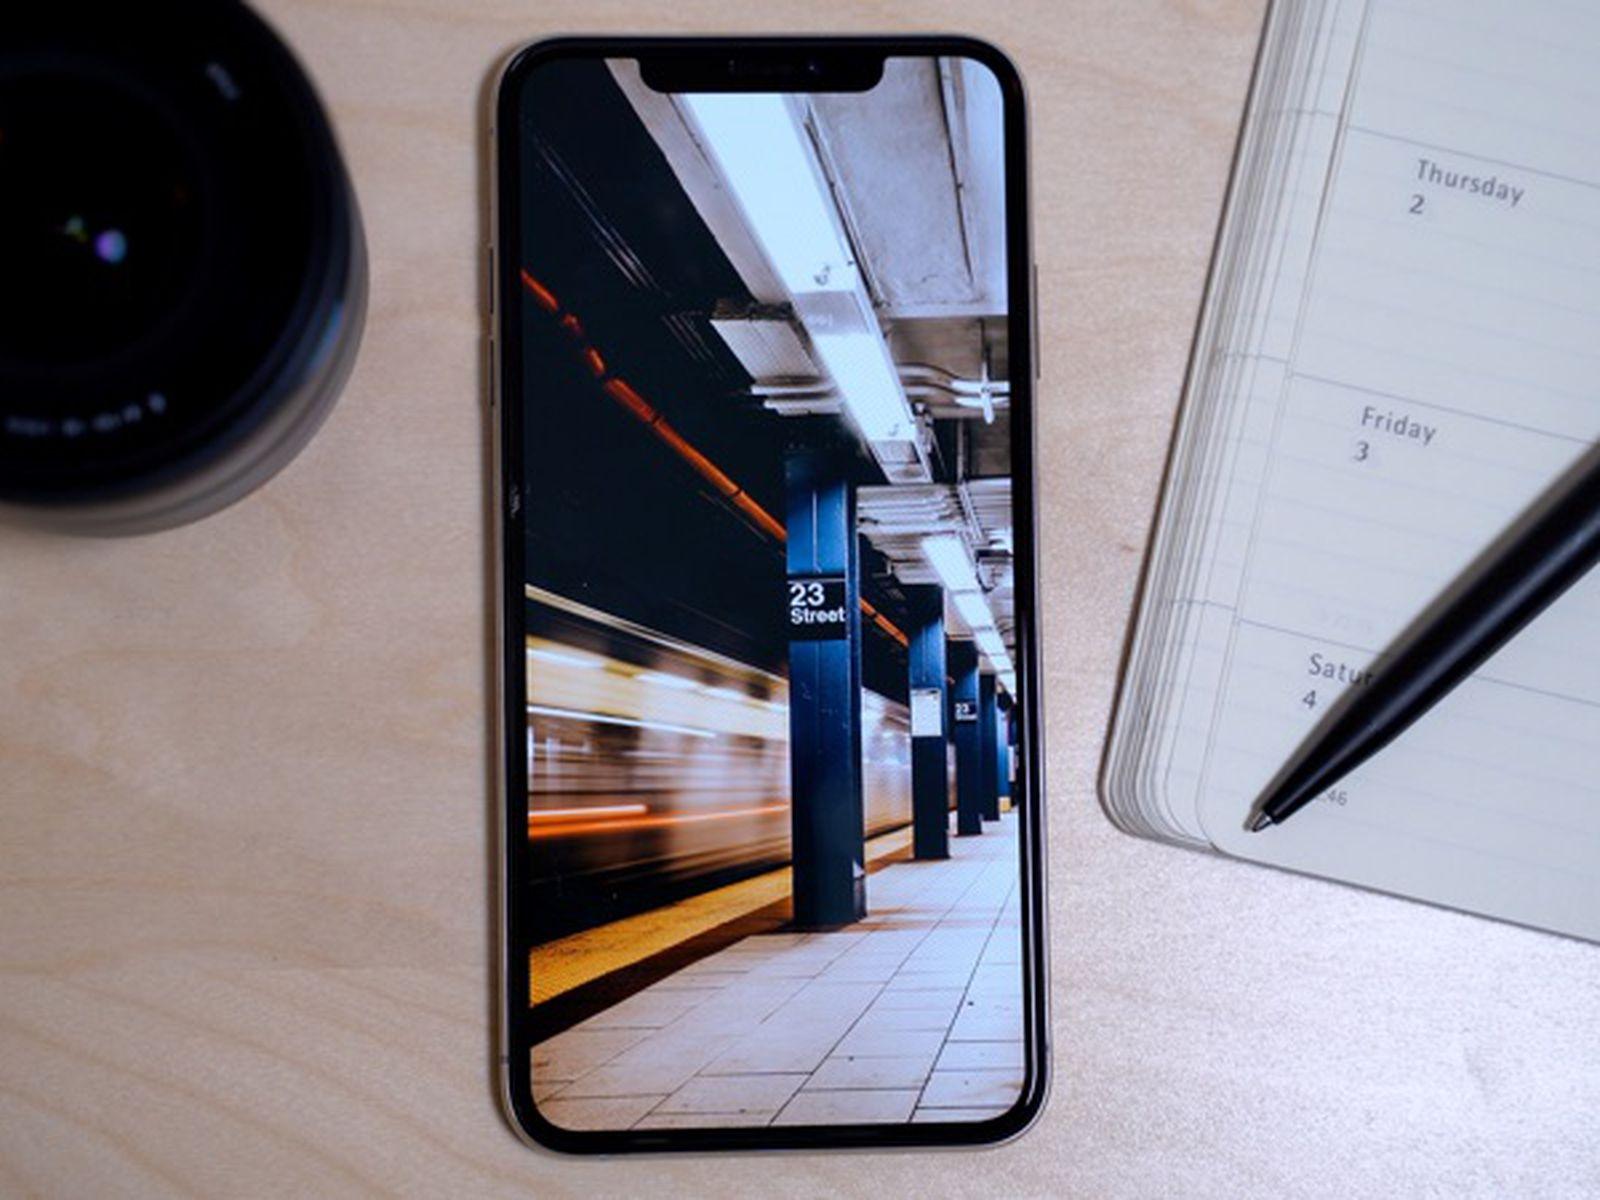 Top Wallpaper Apps For Iphone Ipad And Mac Macrumors